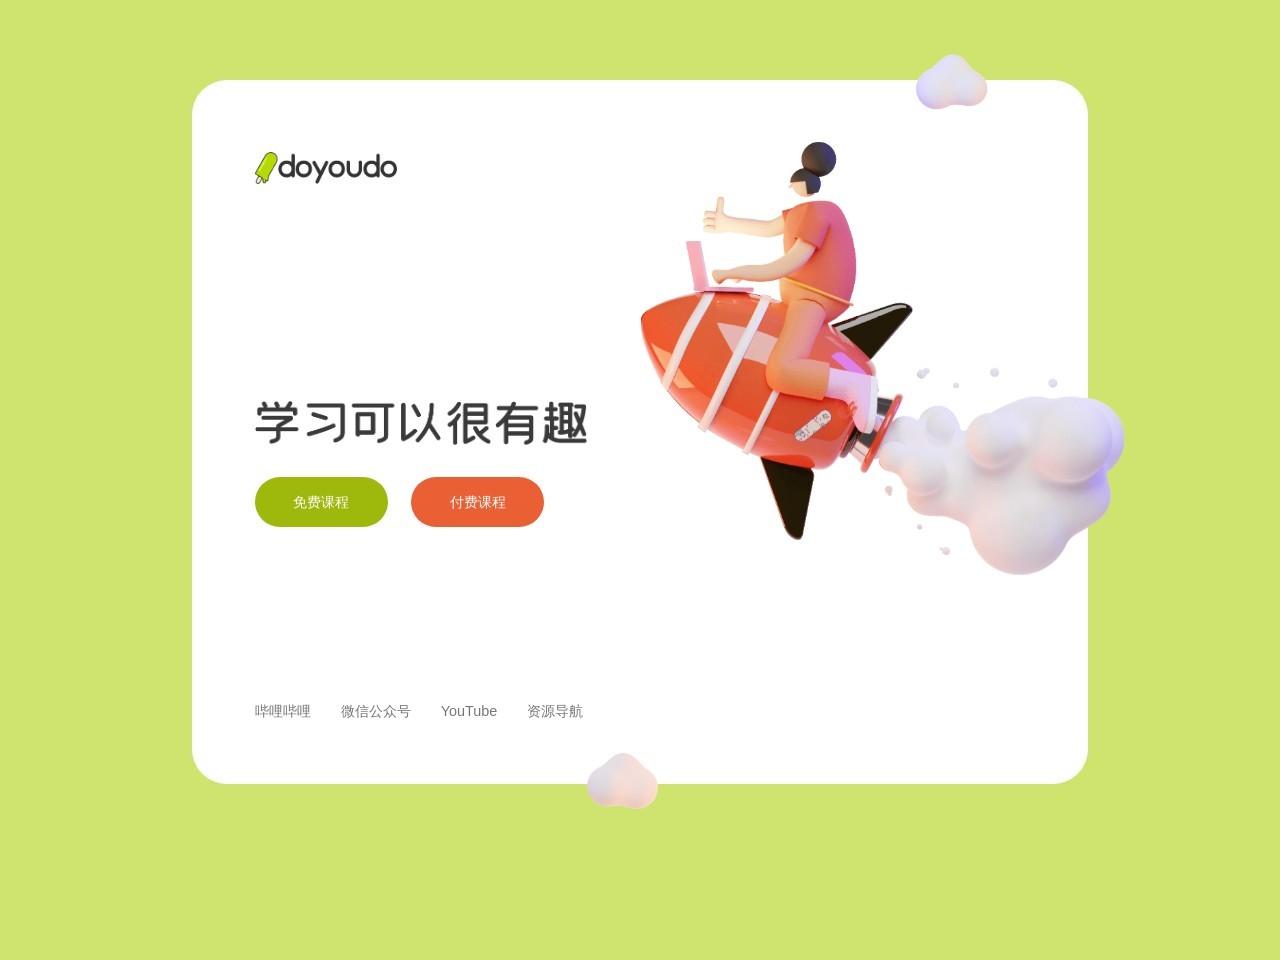 Doyoudo的网站截图